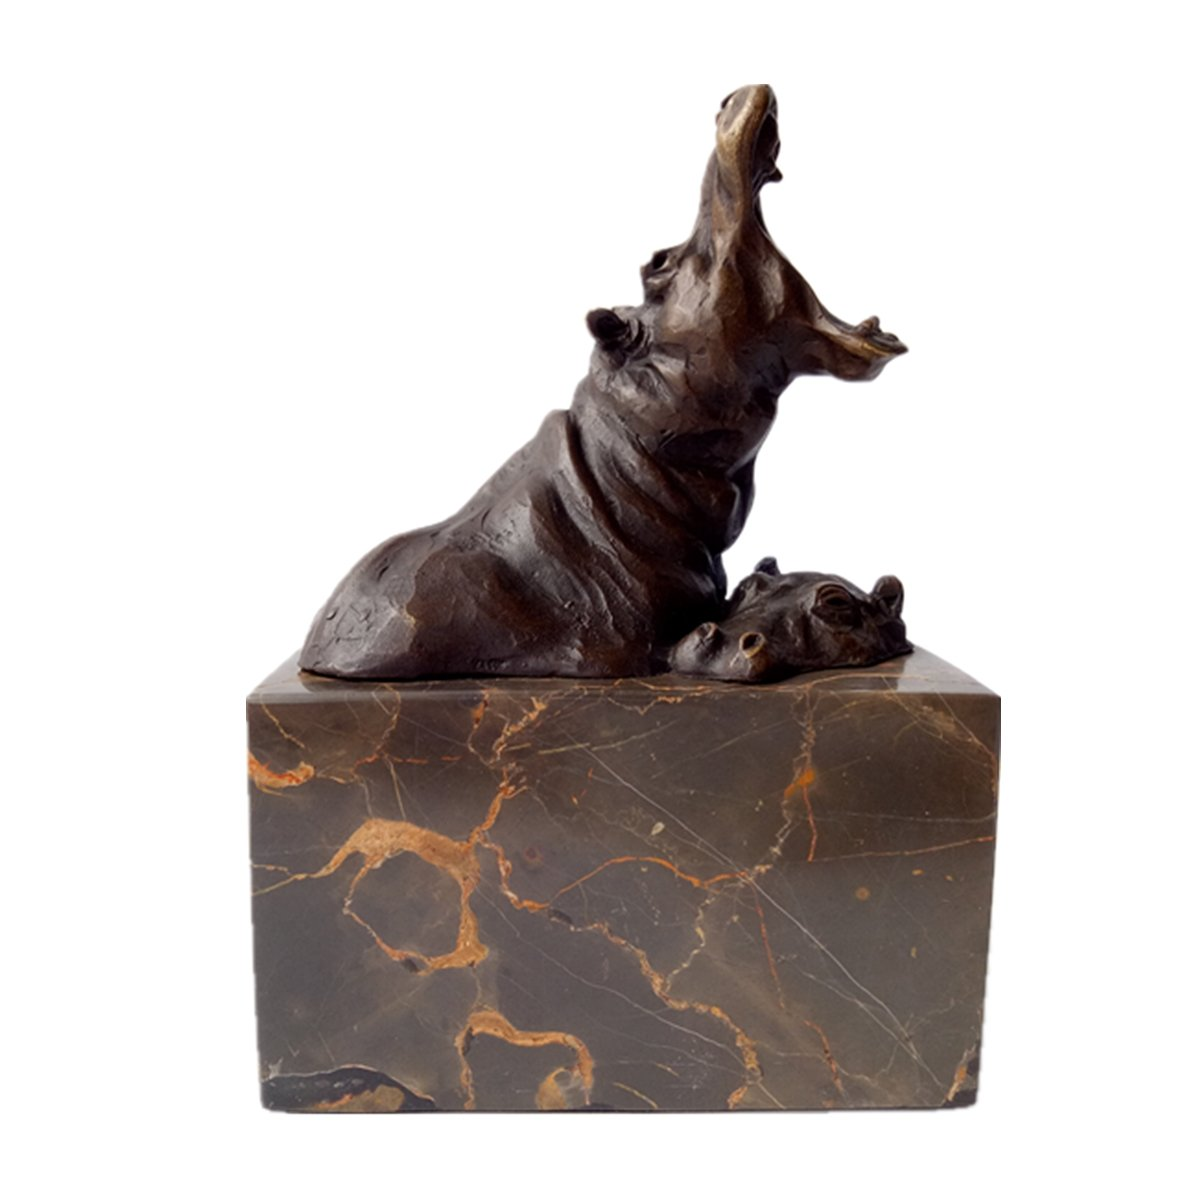 Toperkin Hippo Statue Bronze Sculpture African Hippopotamus Sculpture Animal TPAL-276